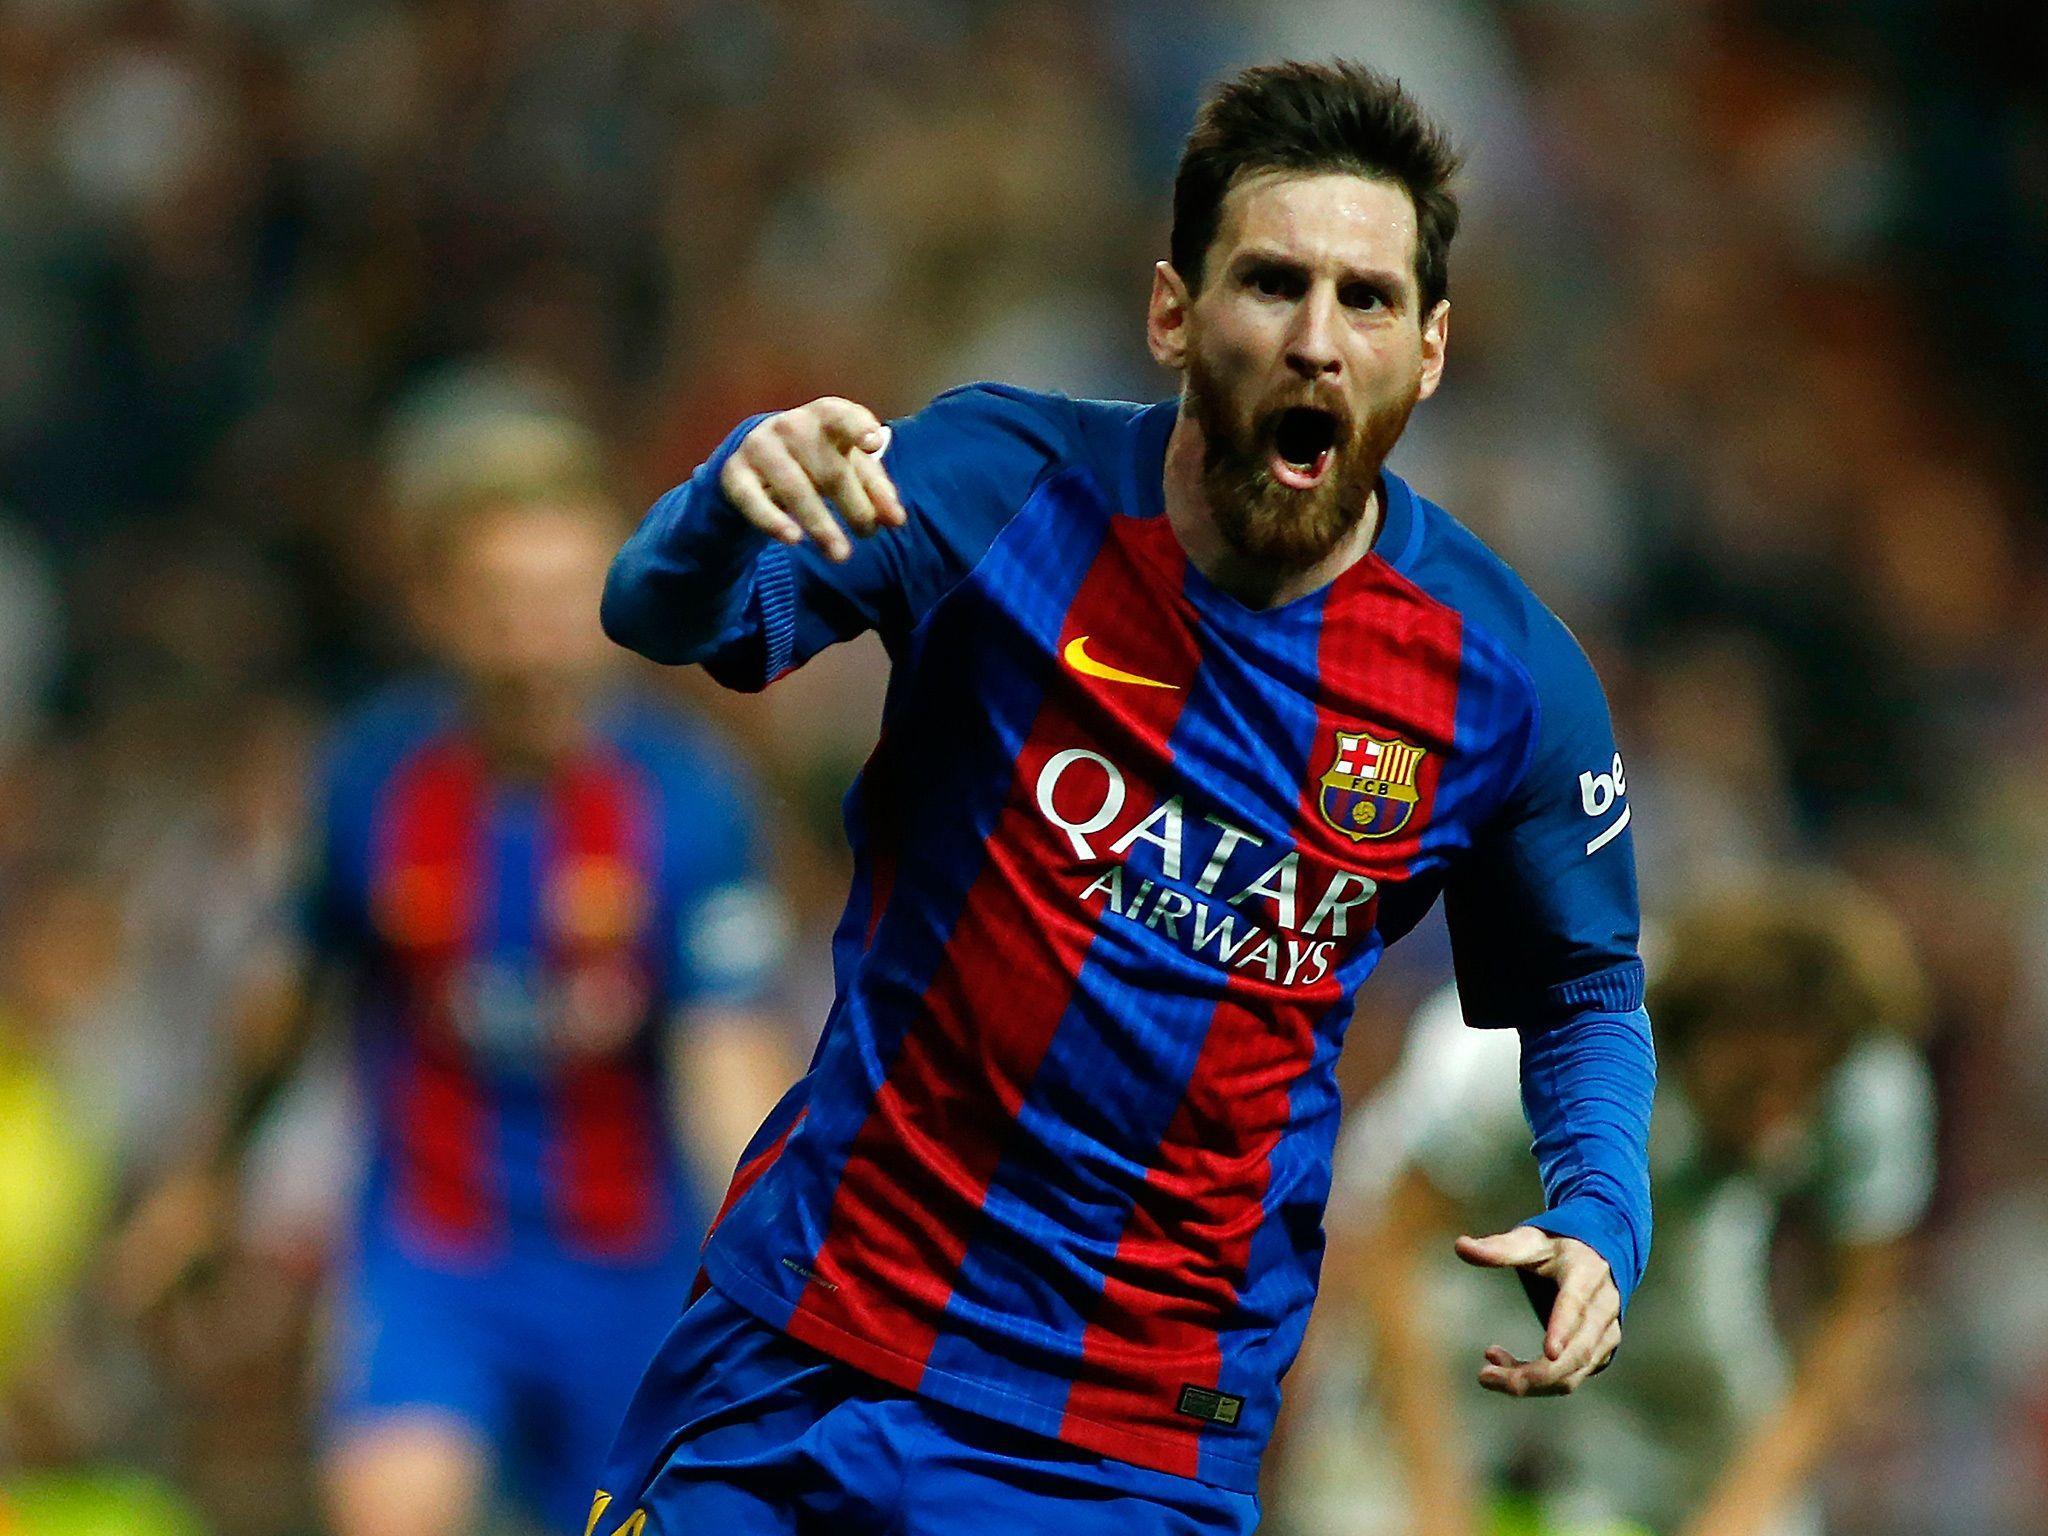 Messi Wallpapers 2020 4k